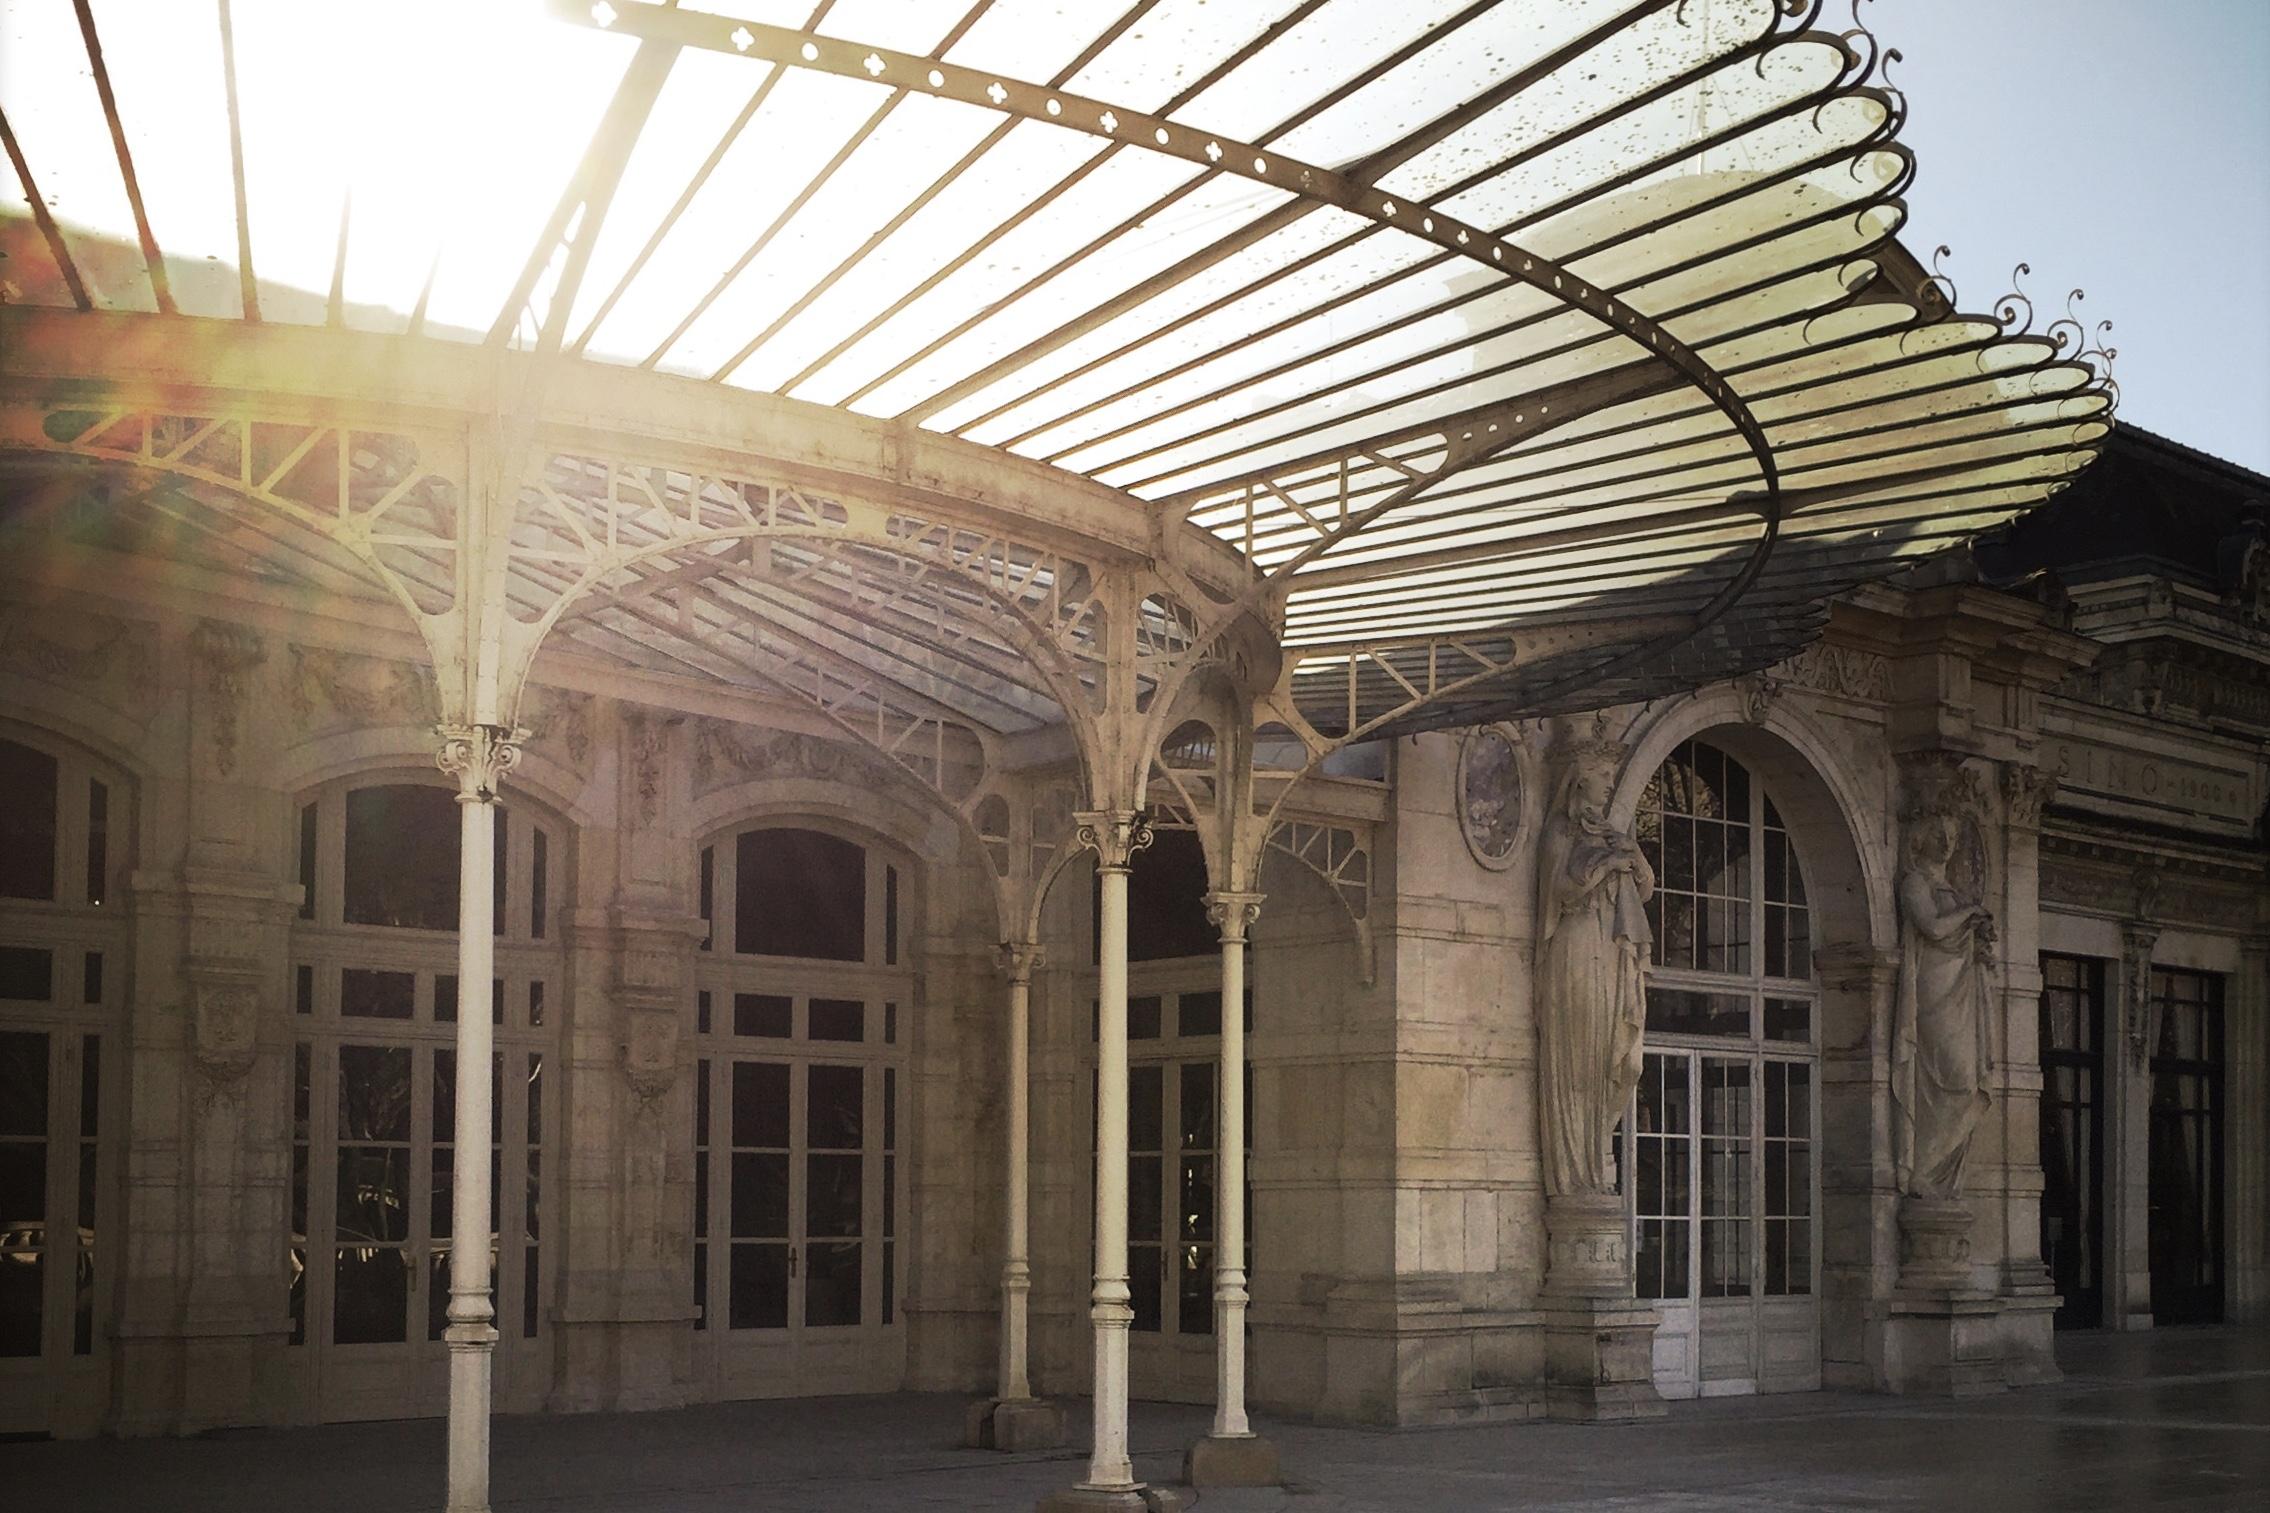 To DoÀ visiter… - Vichy, Moulins, Clermont-Ferrand, Montluçon, les villes, ses musées, great musea, la campagne, the cities, the country side, l'Allier, l'Auvergne, perfect restaurants, good food, nice people...enjoy...